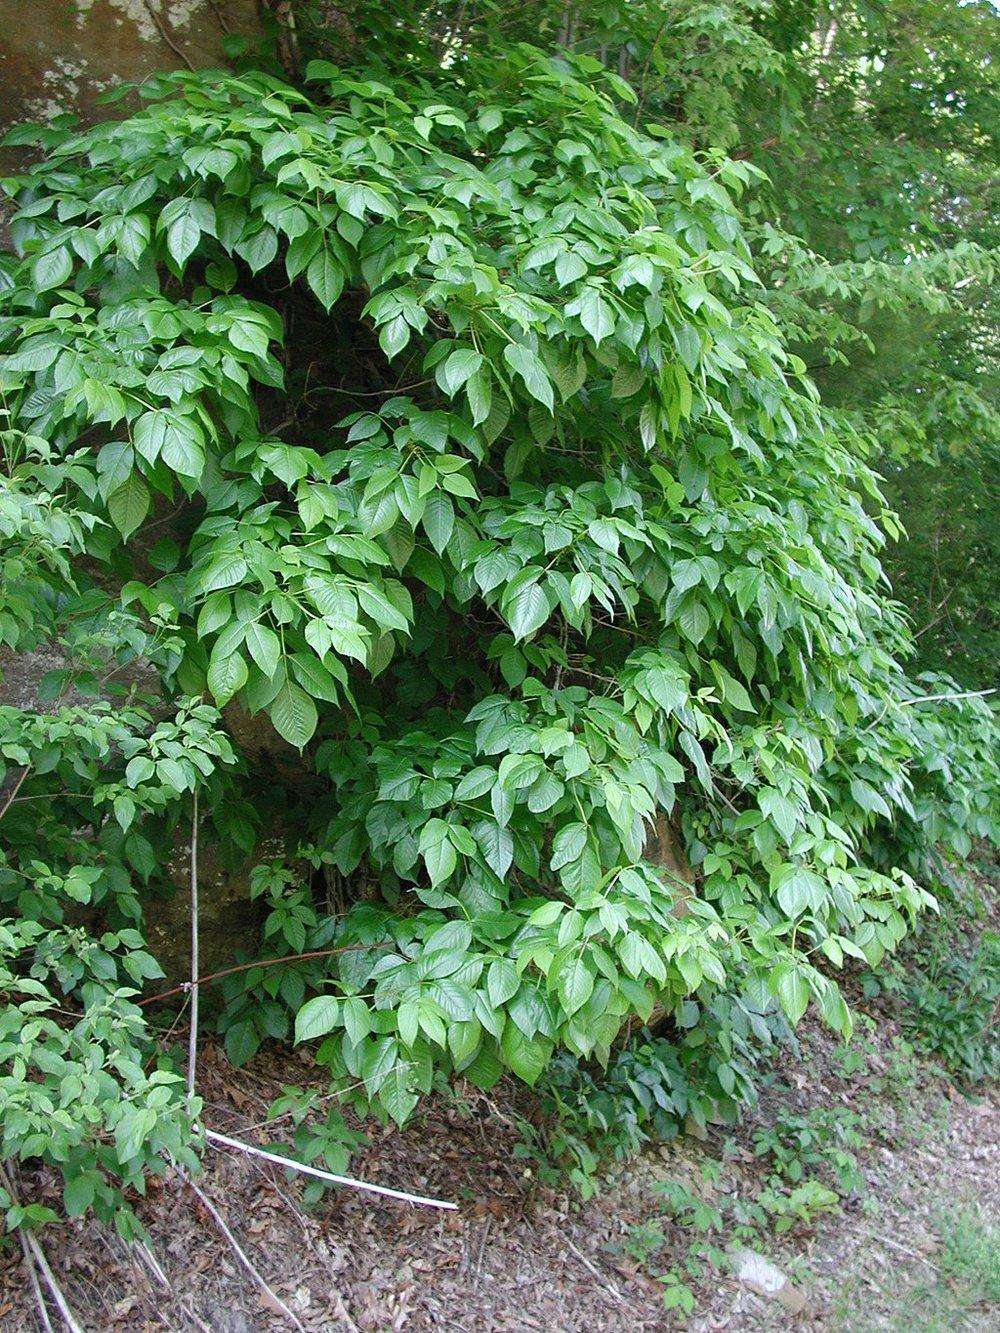 Poison ivy on a roadside    --Photo by Jaknous e